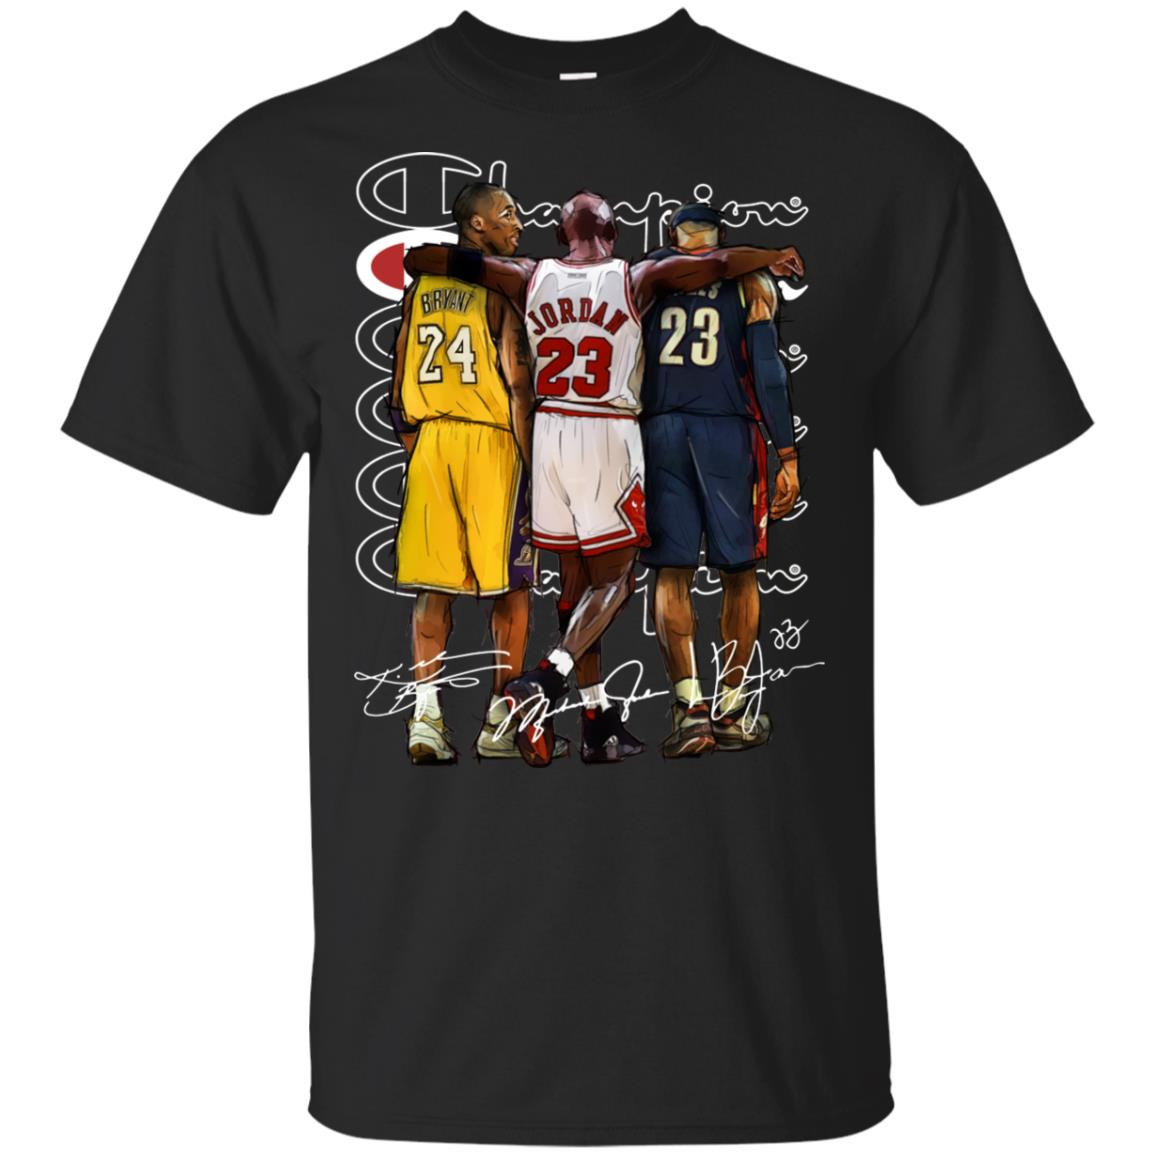 cheaper 2376d 7338d Kobe Bryant, Michael Jordan and LeBron James Champion hoodie, ls, t shirt